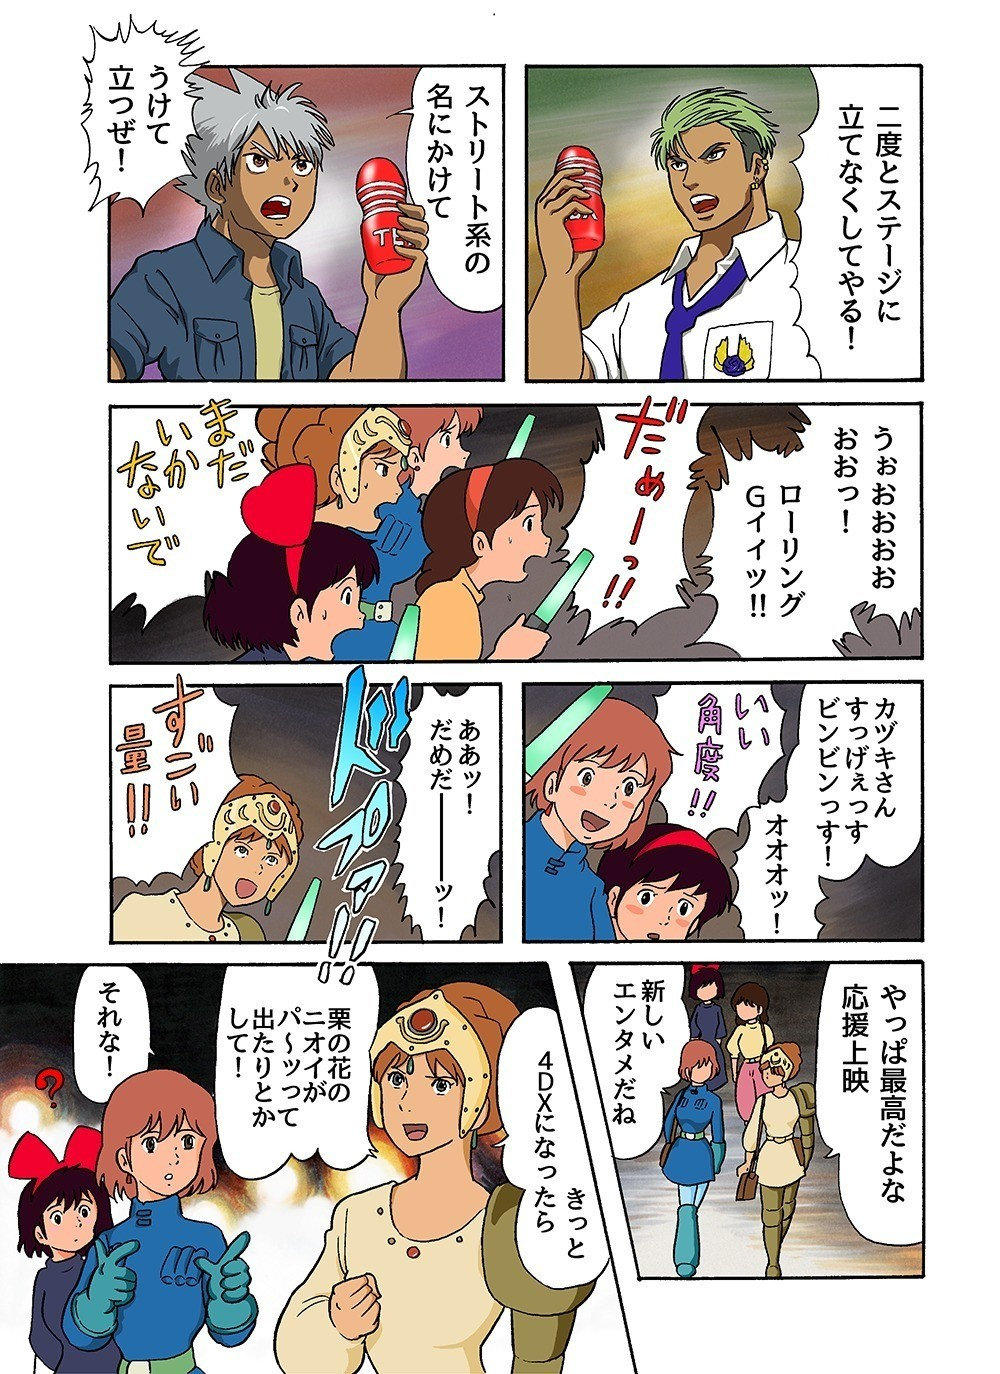 三鷹の森の応援上映会 田中圭一 面白い漫画 面白い画像